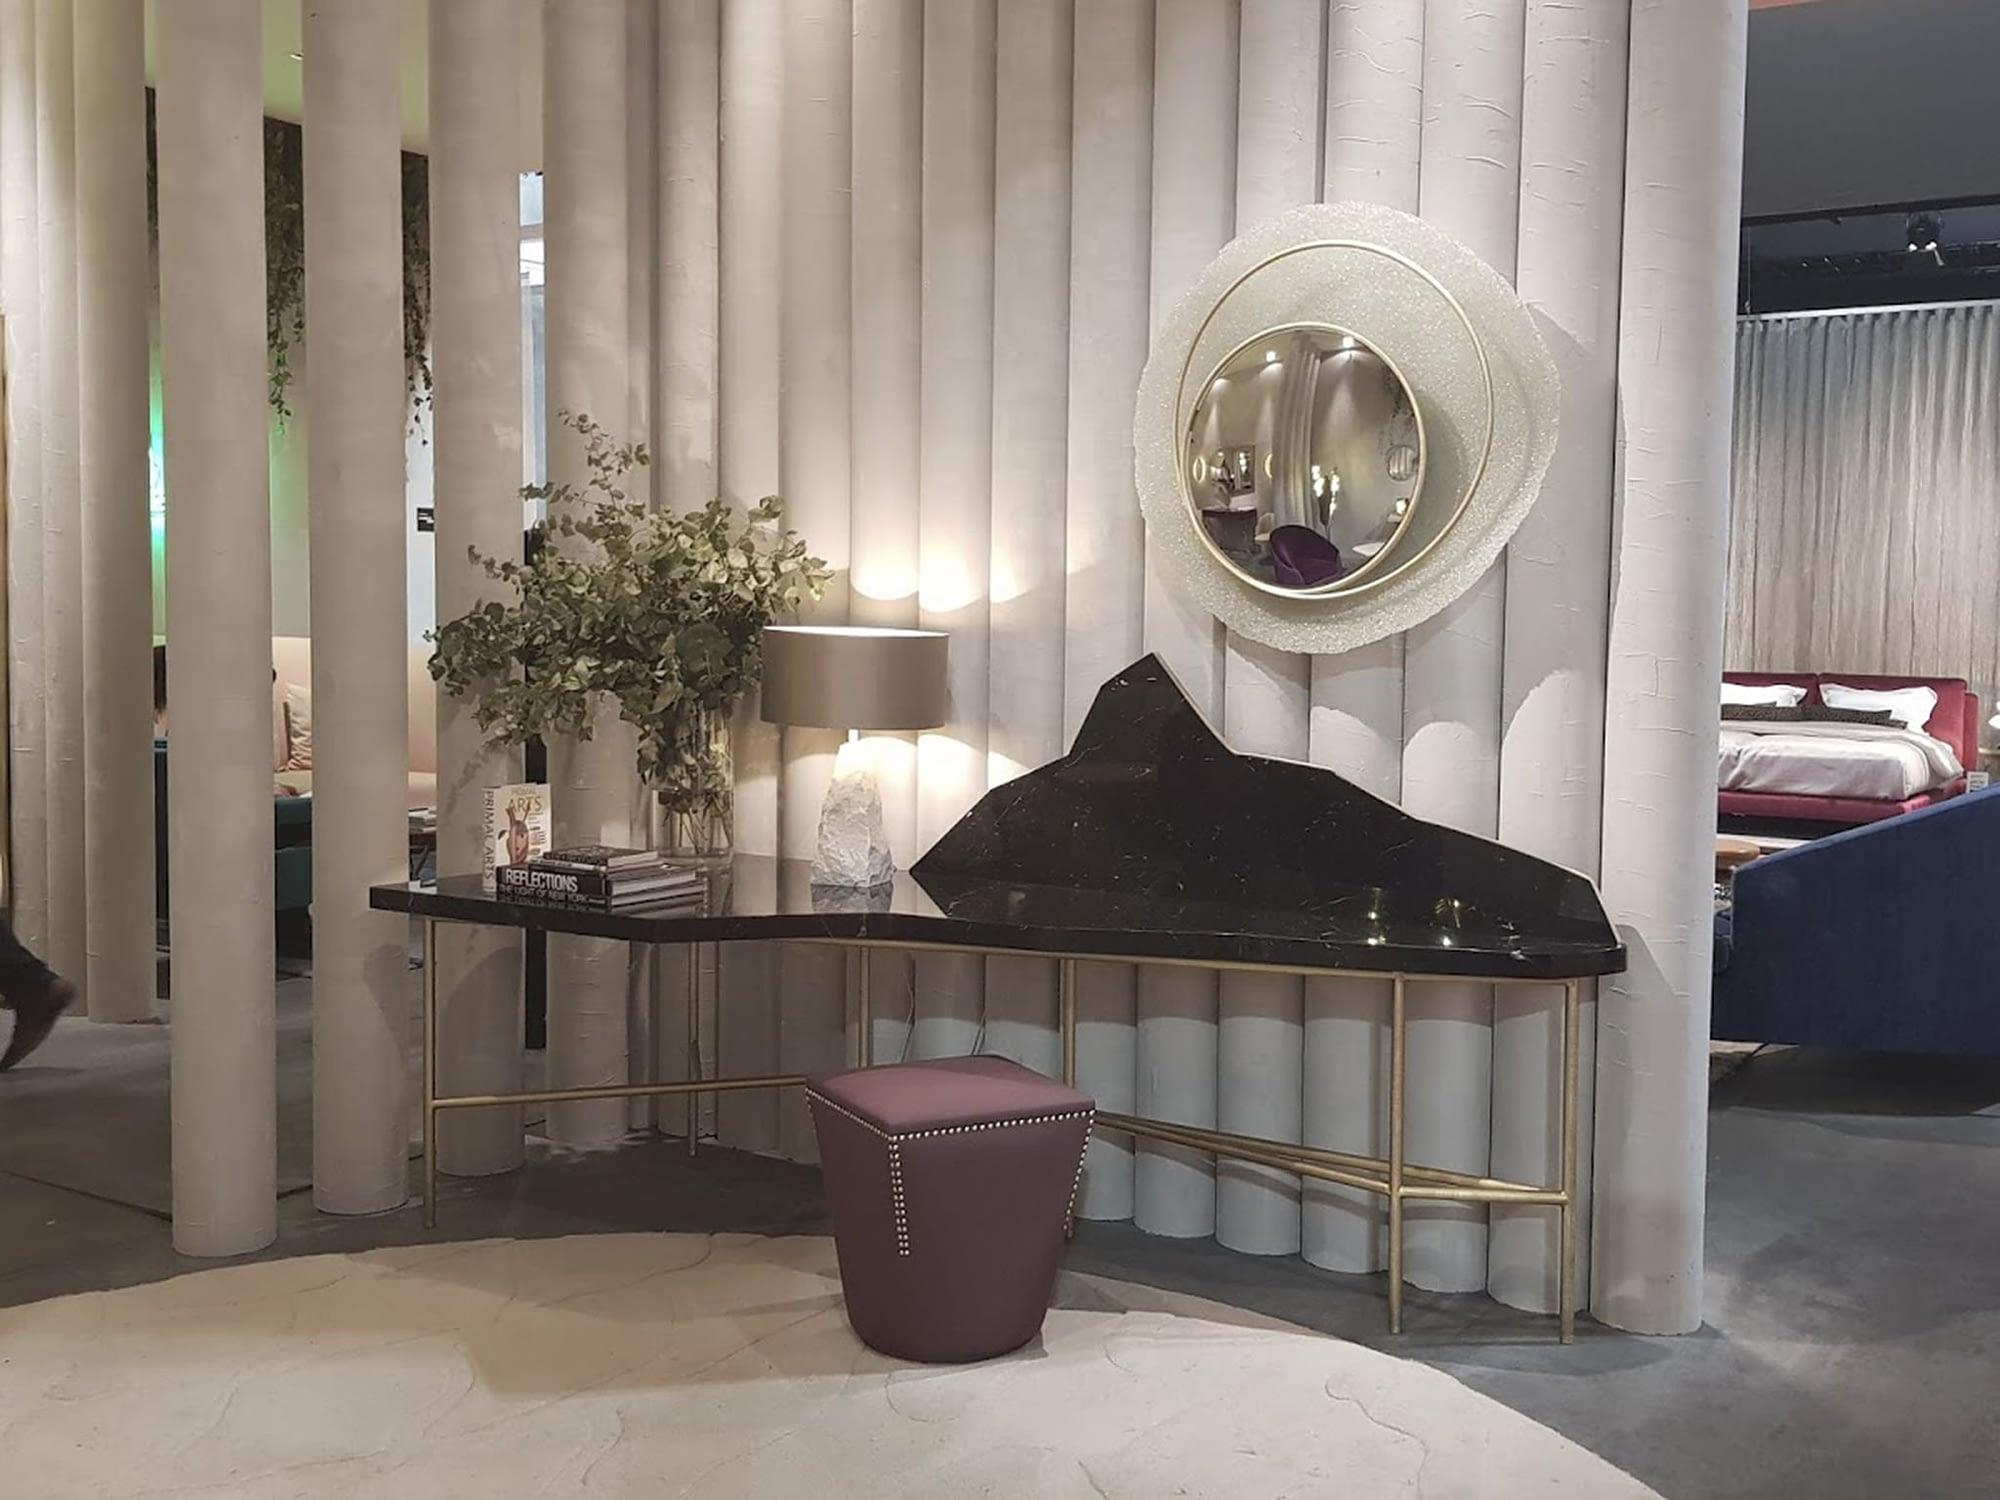 Milano Design Week 2018 - Salone del Mobile 49